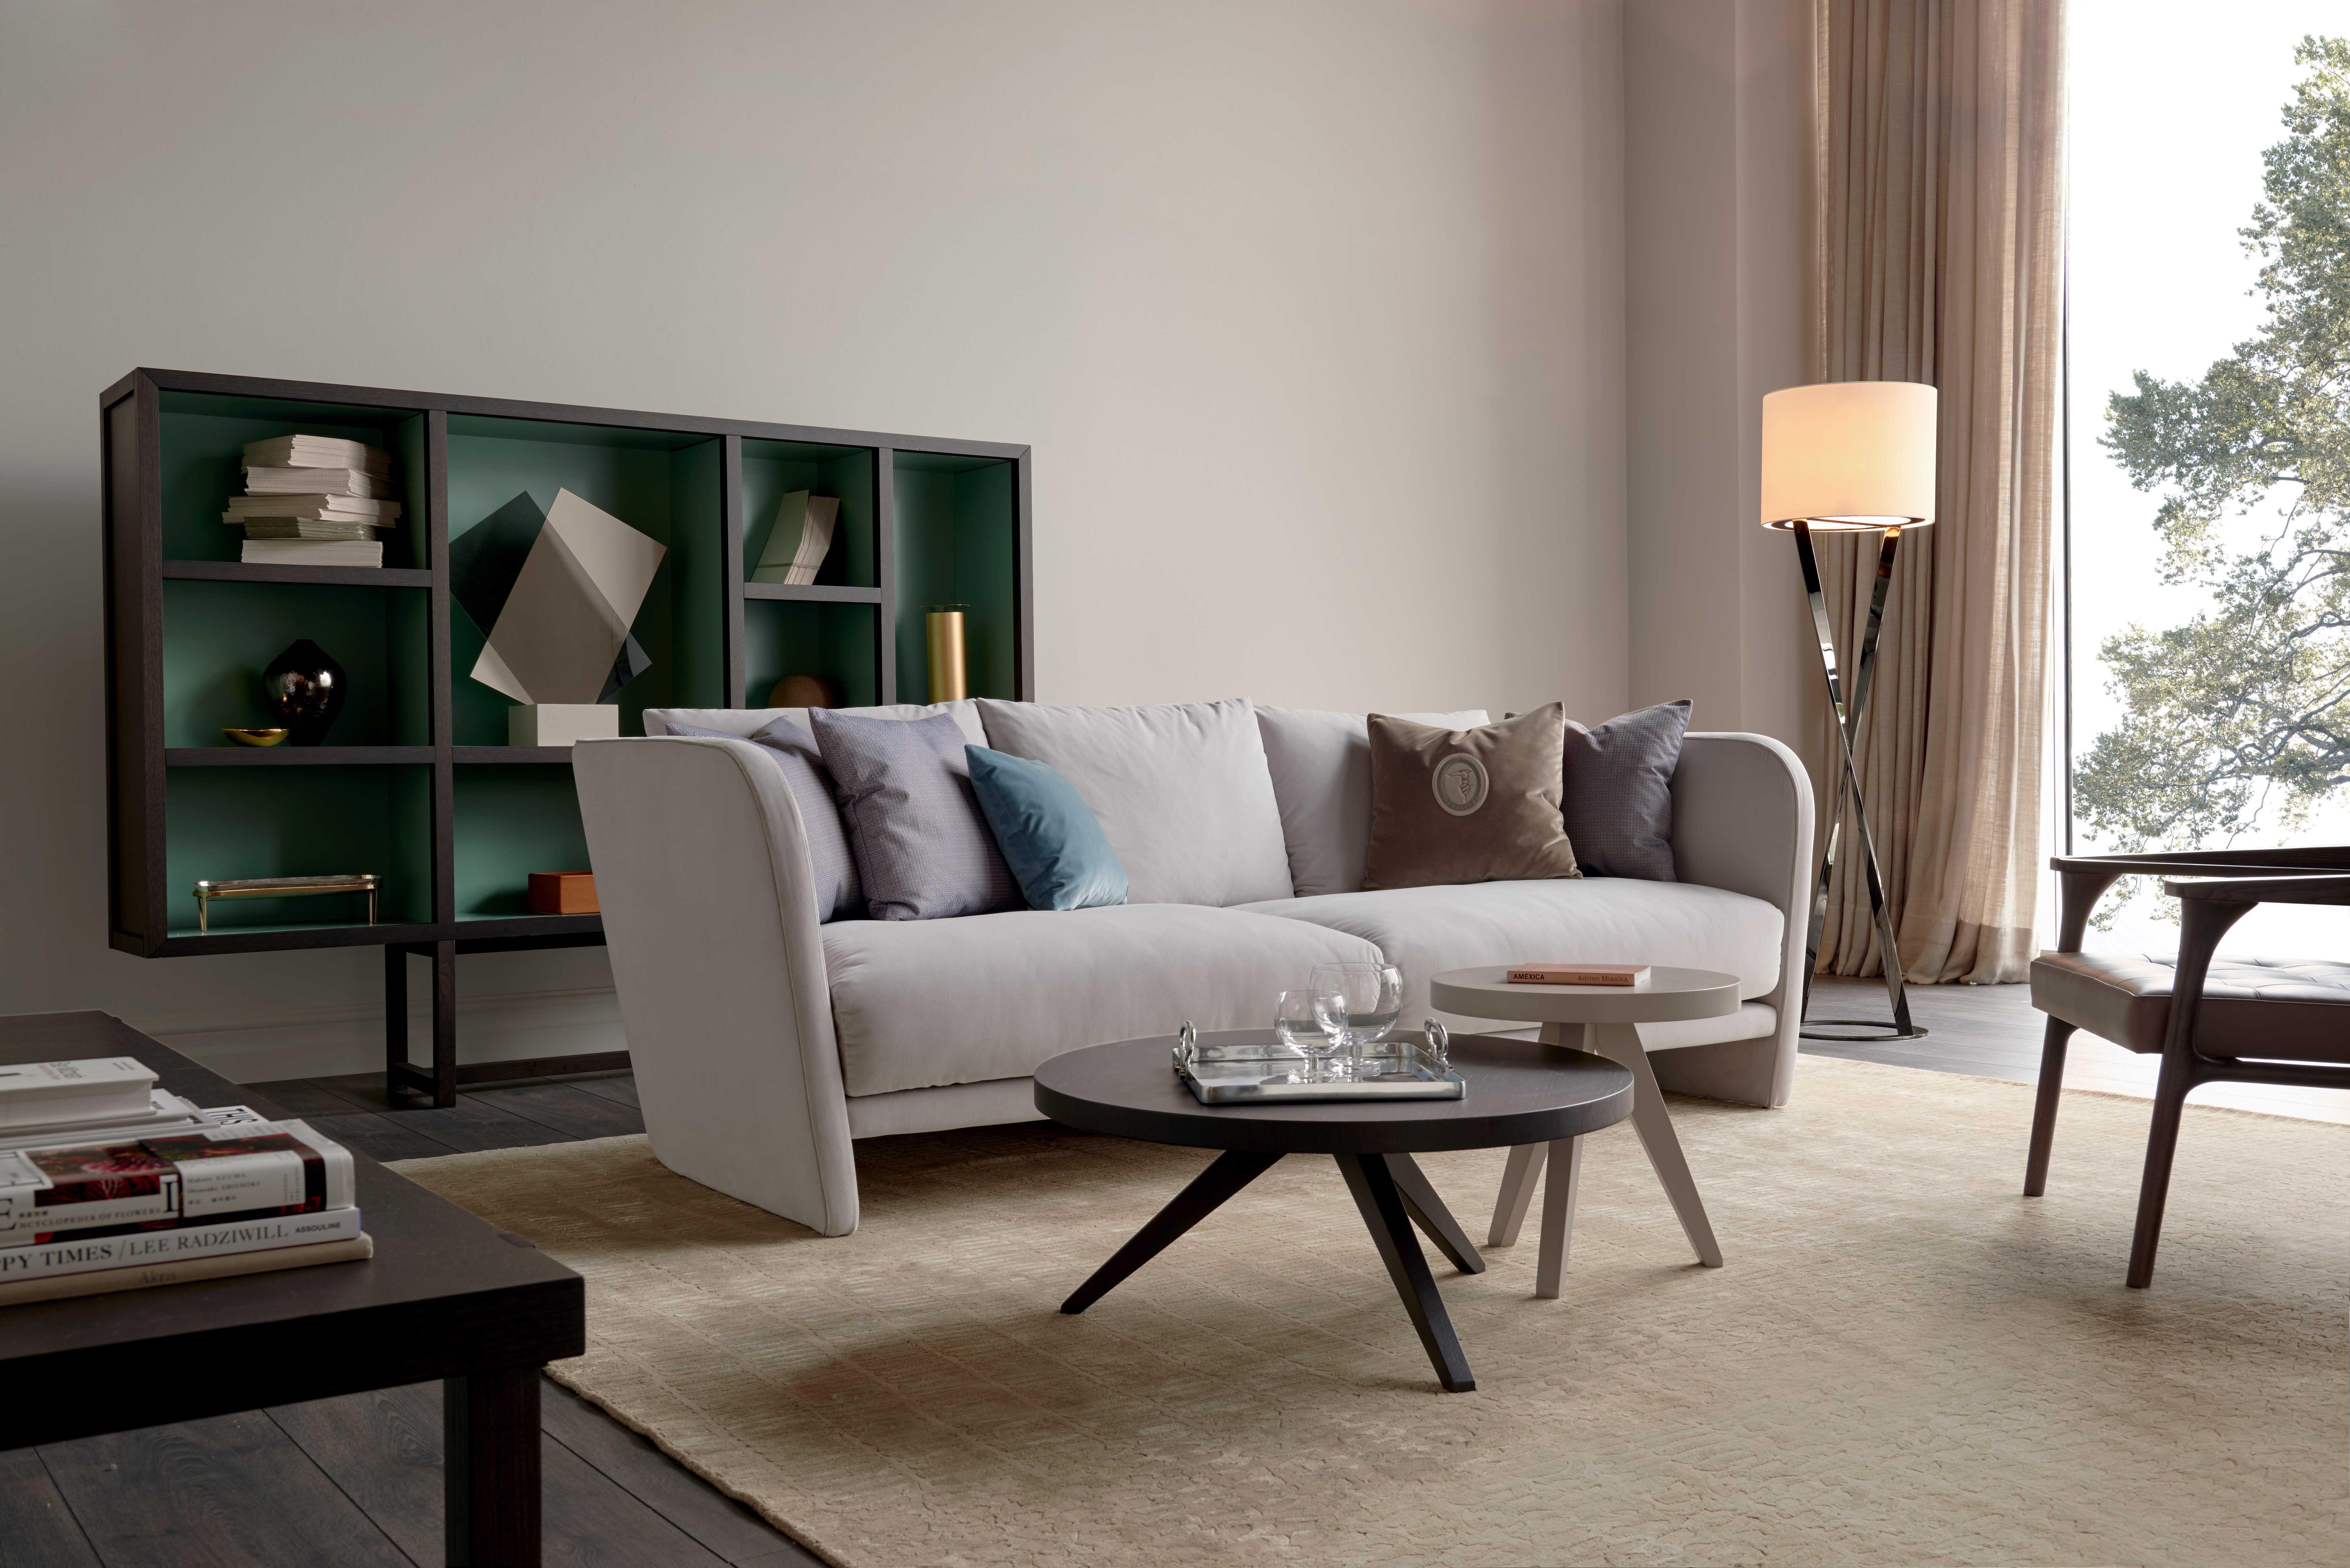 tr-lightshell-sofa-casilia-lounge-armchair-totem-bookshelf